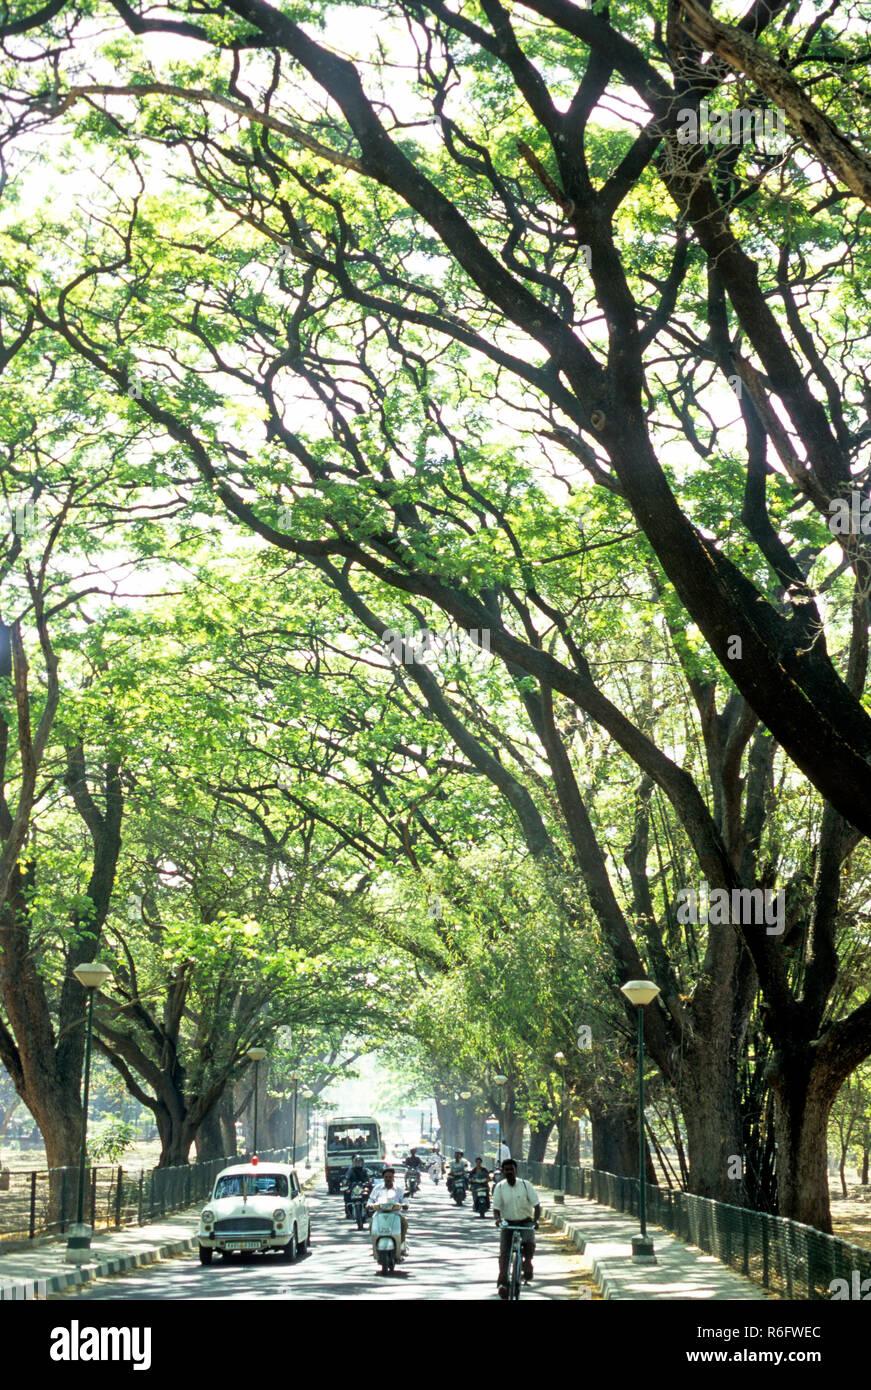 cubbon park laid out in 1864 by richard sankey, bangalore, karnataka, india - Stock Image